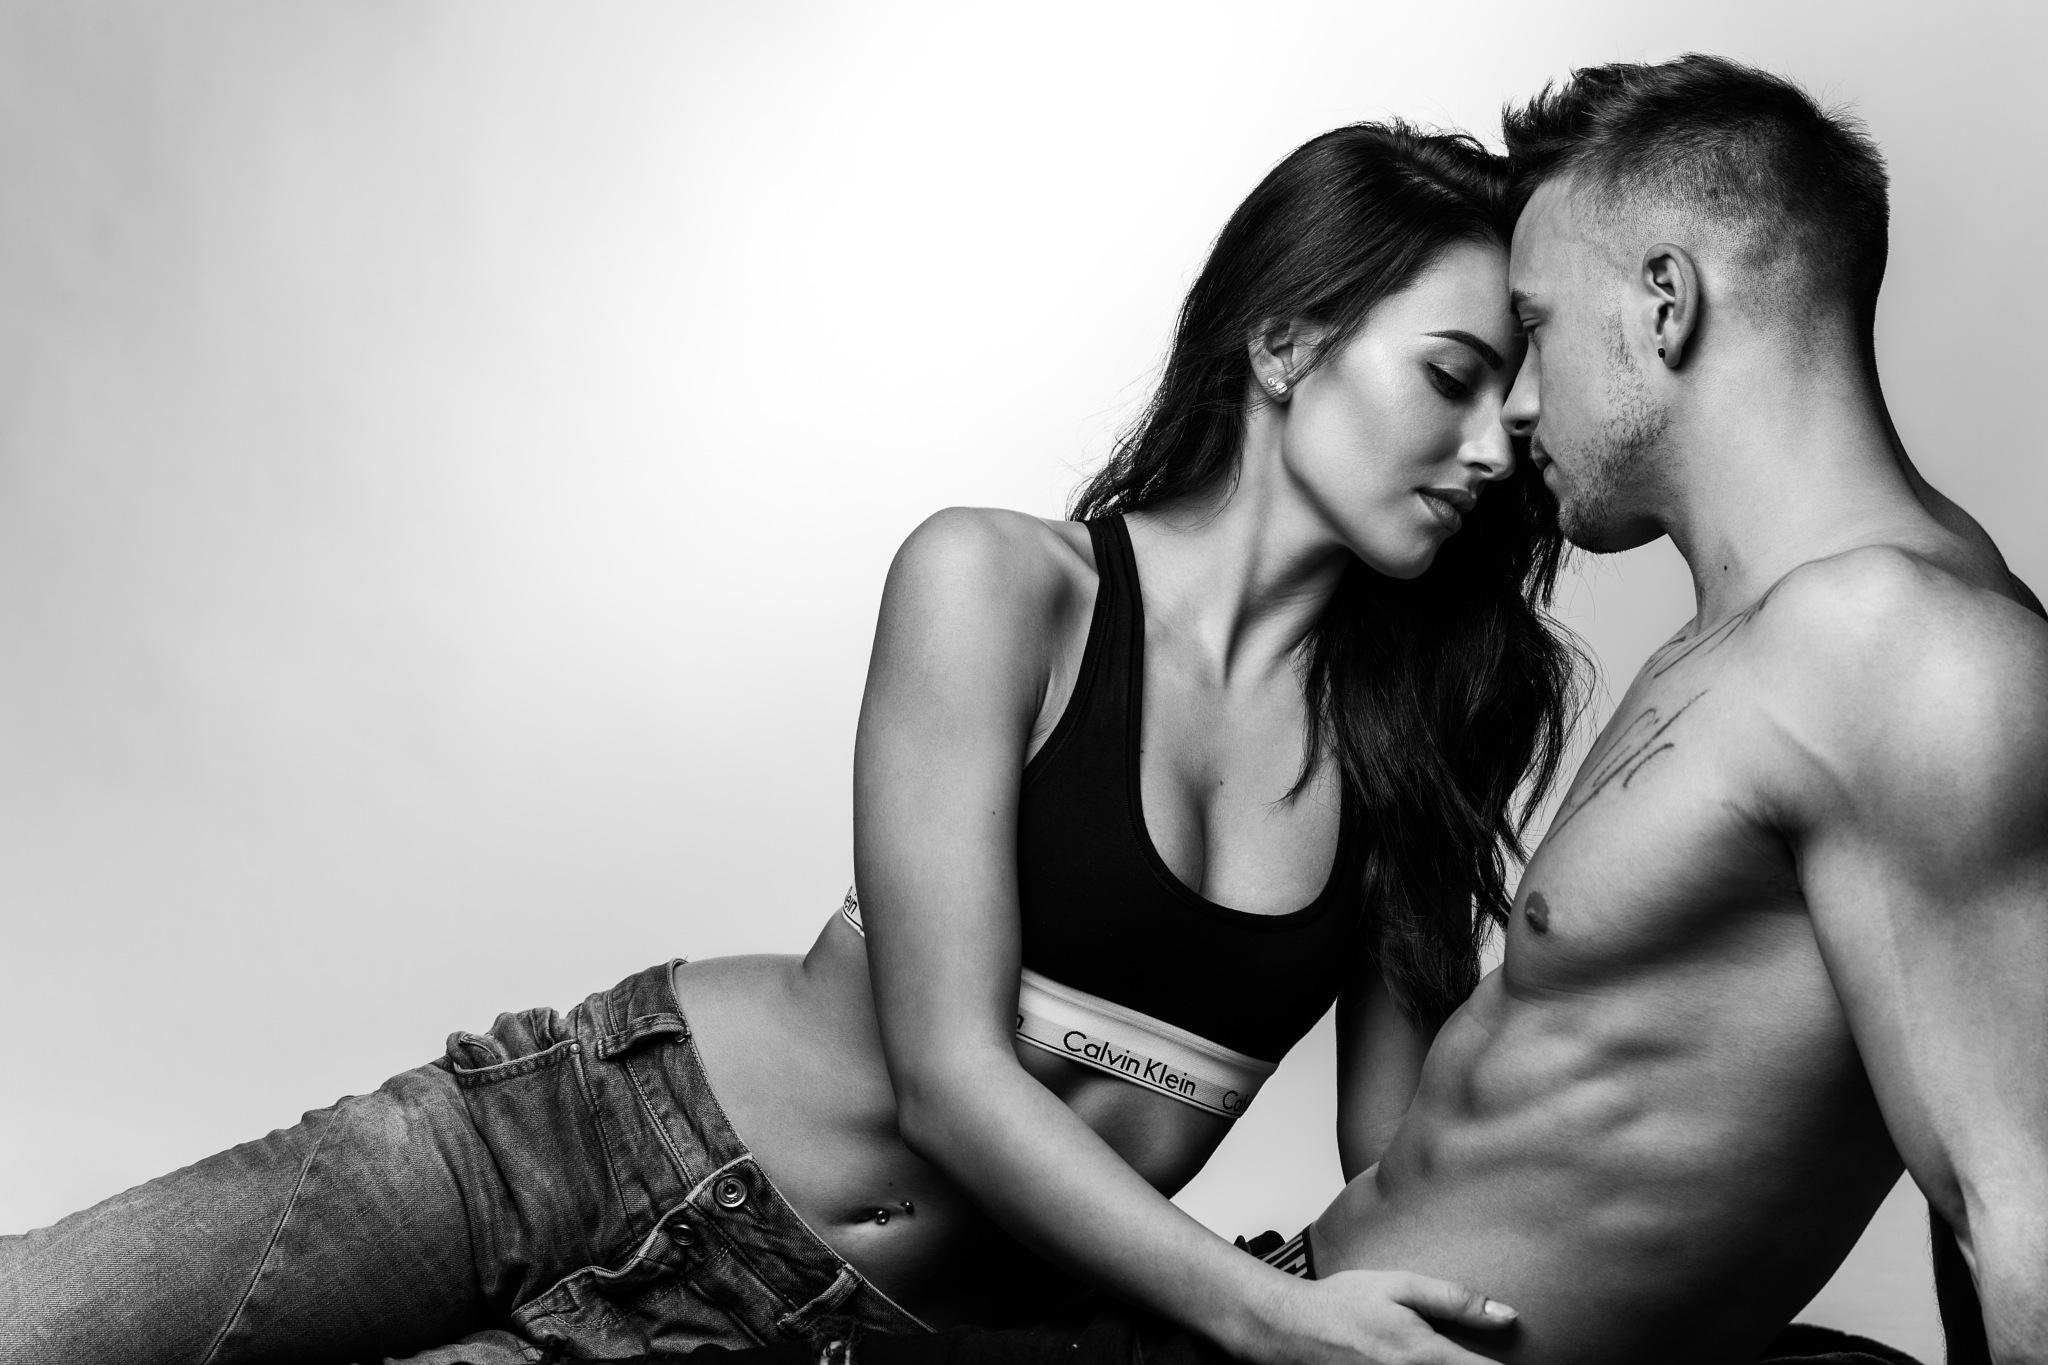 Intimacy by Christoph Gross